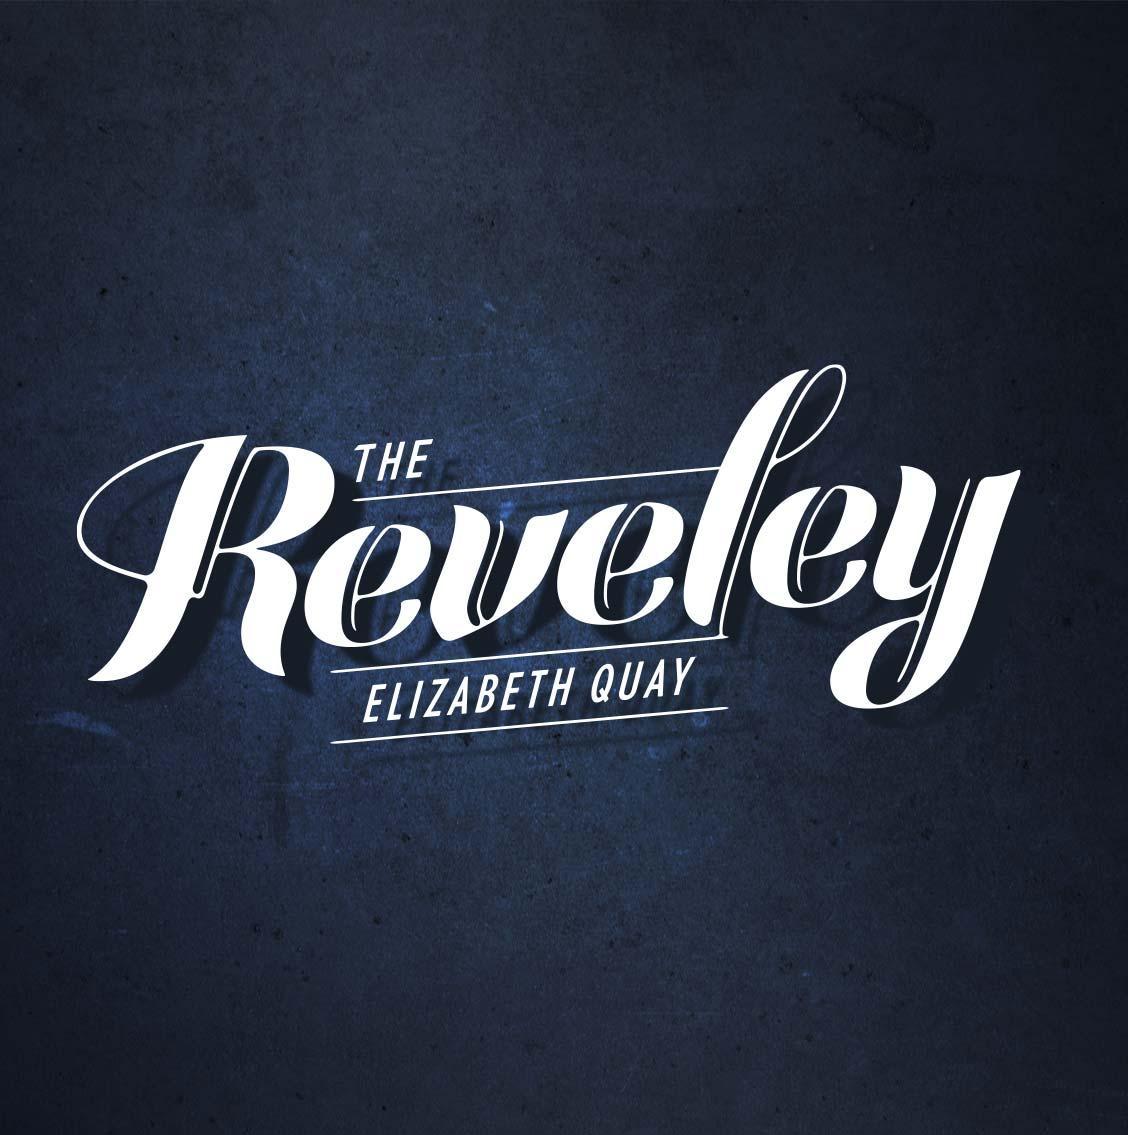 IdentityPerth-Gallery-3x4-TheReveley.jpg